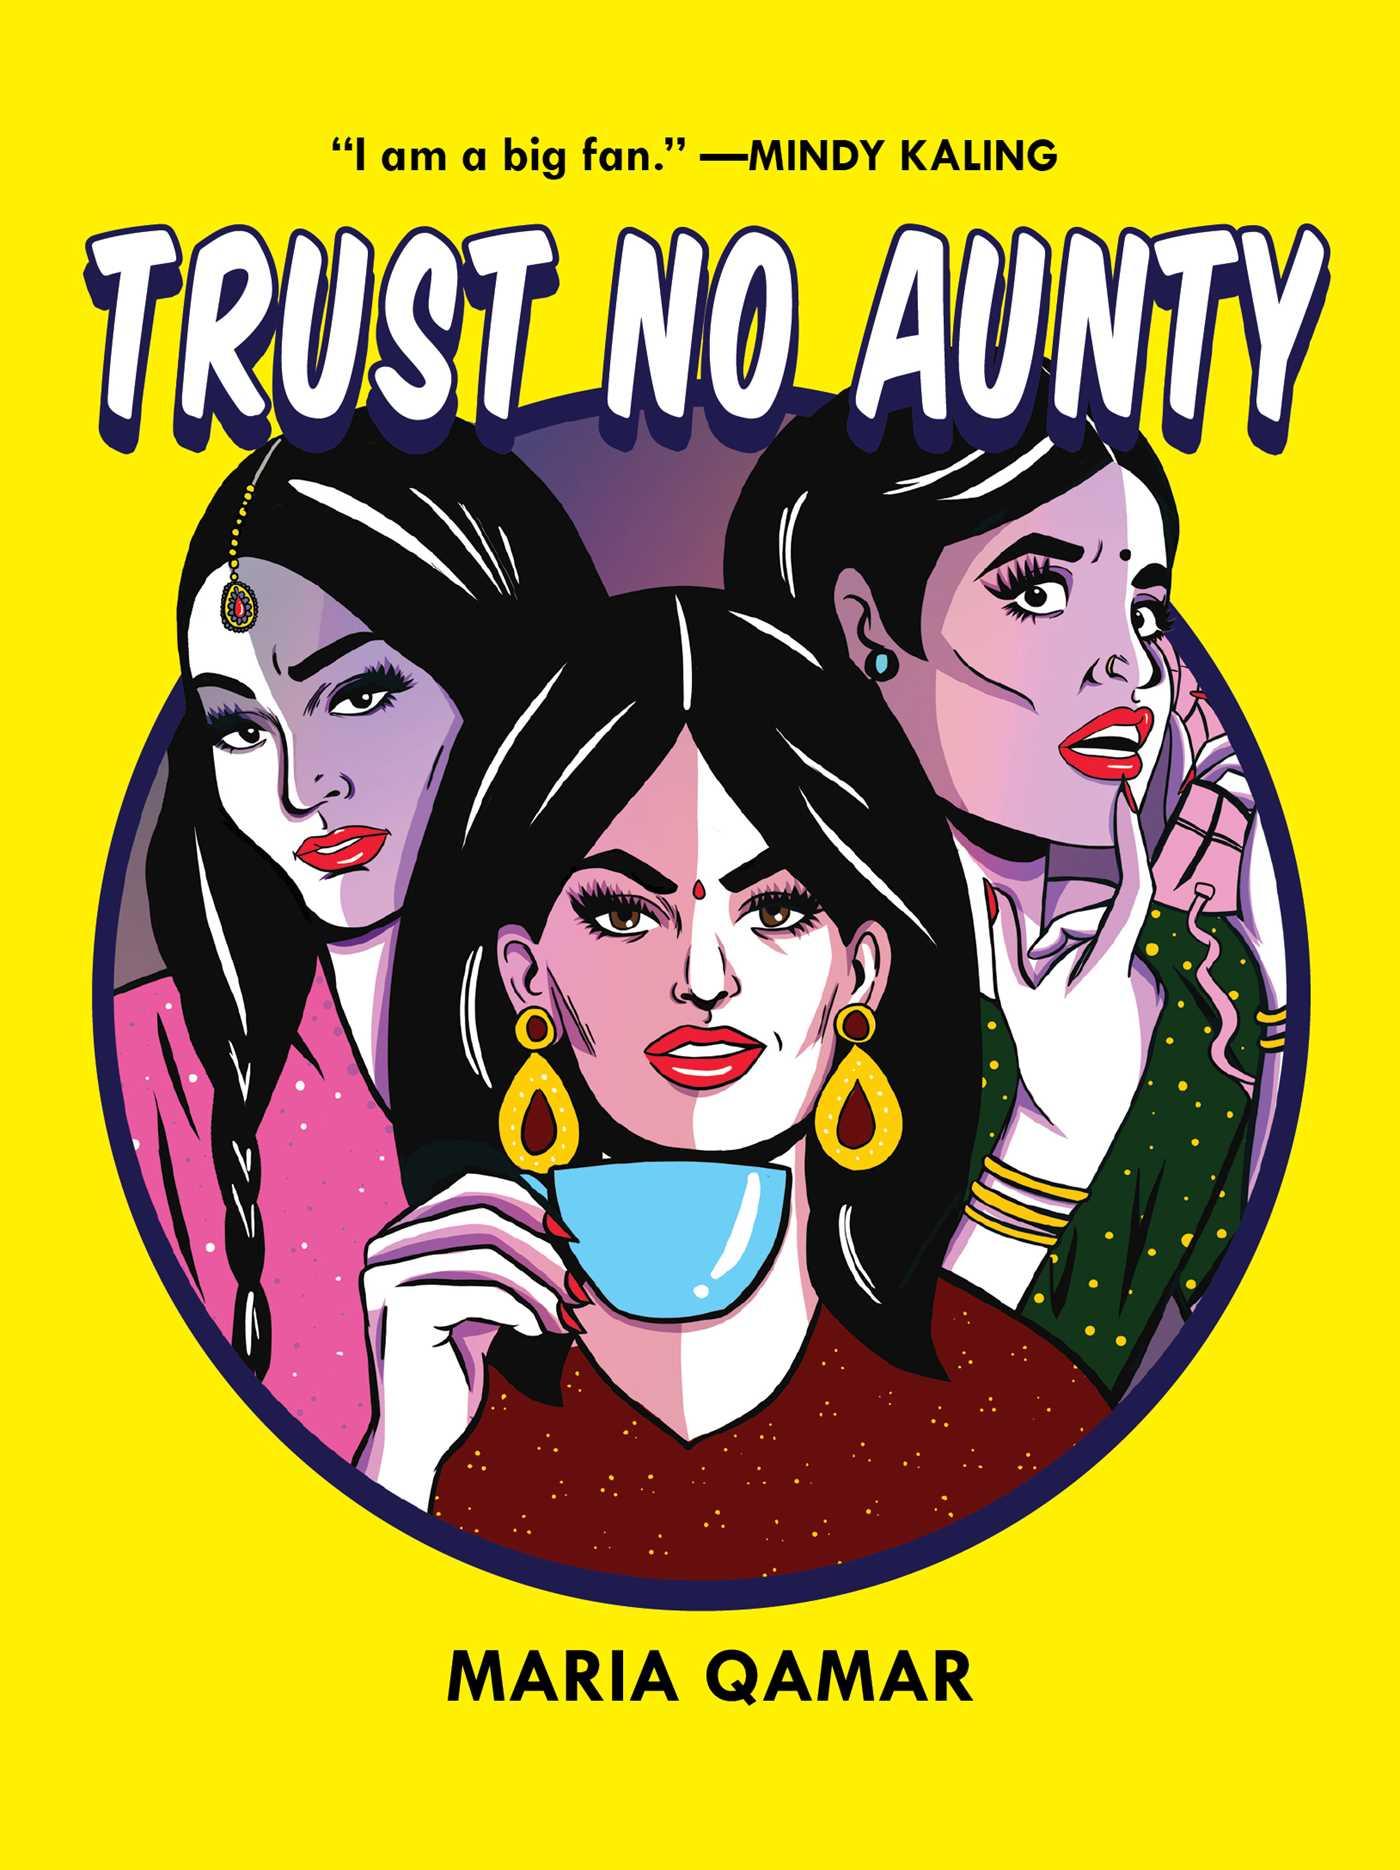 Trust no aunty 9781501154737 hr